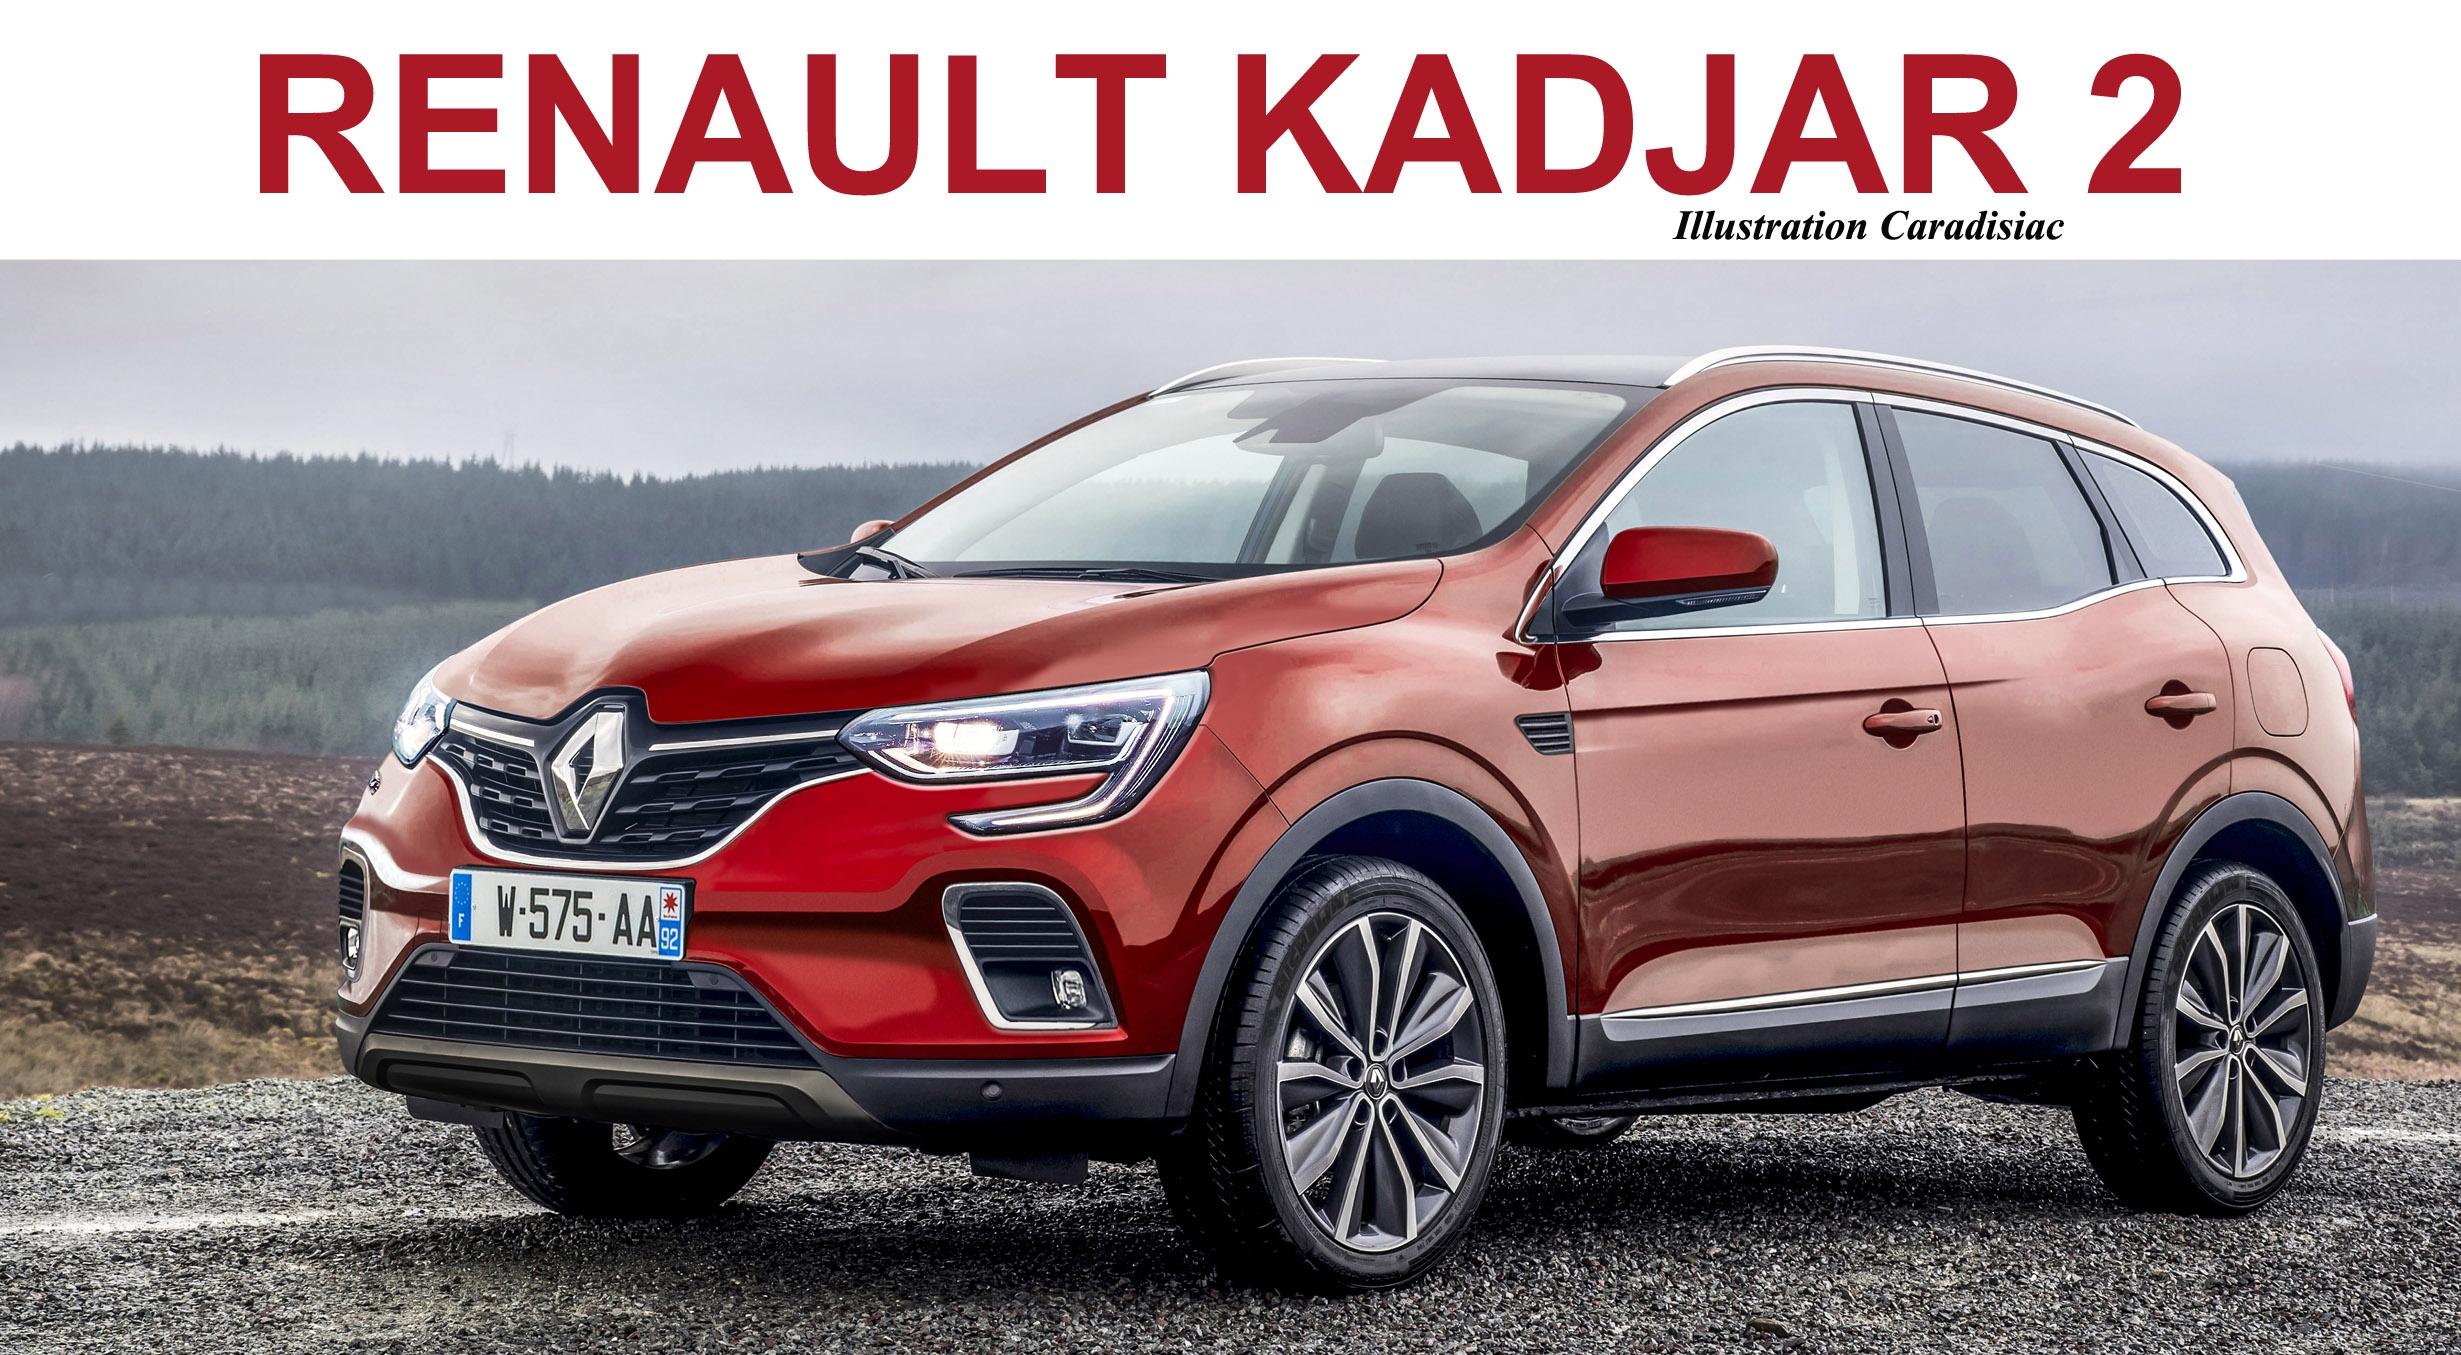 Risultato immagini per Renault Kadjar 2022